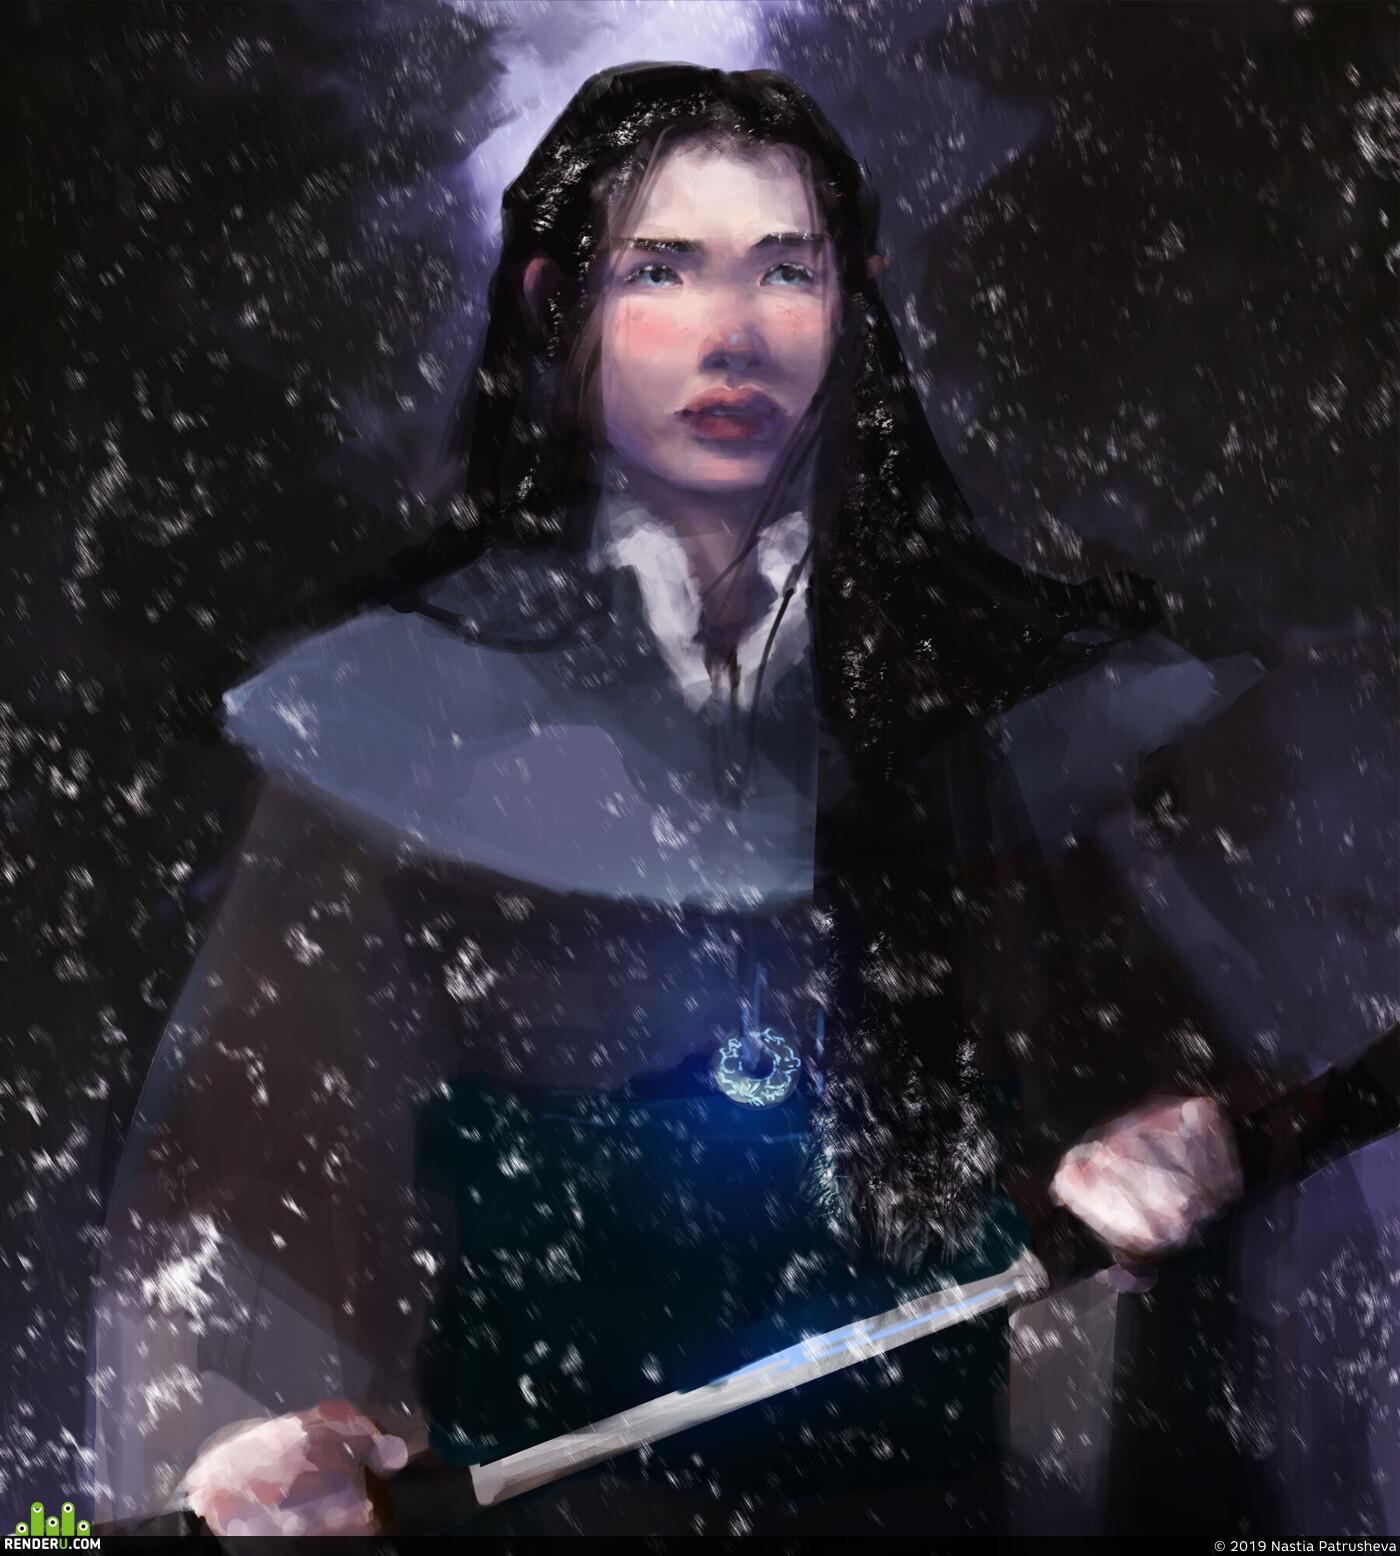 скетч, иллюстрация, портрет, самурай, фентези, Япония, эльф, Катана